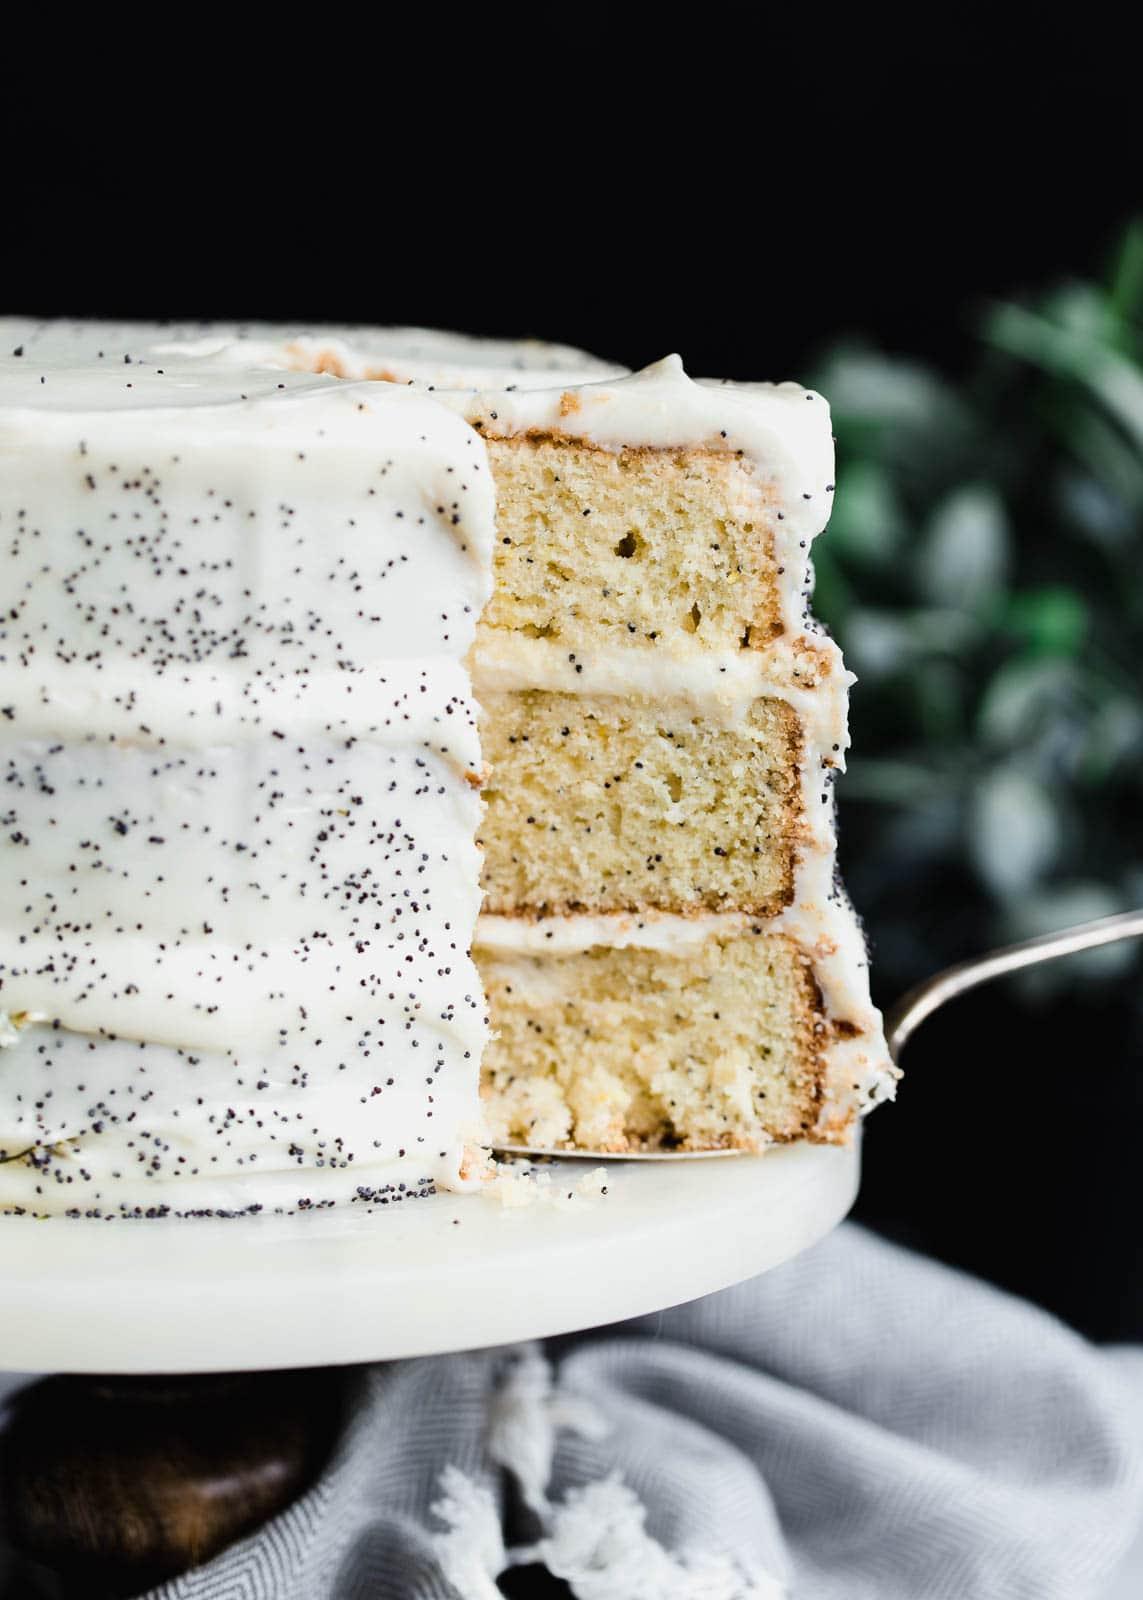 lemon poppy seed cake being cut